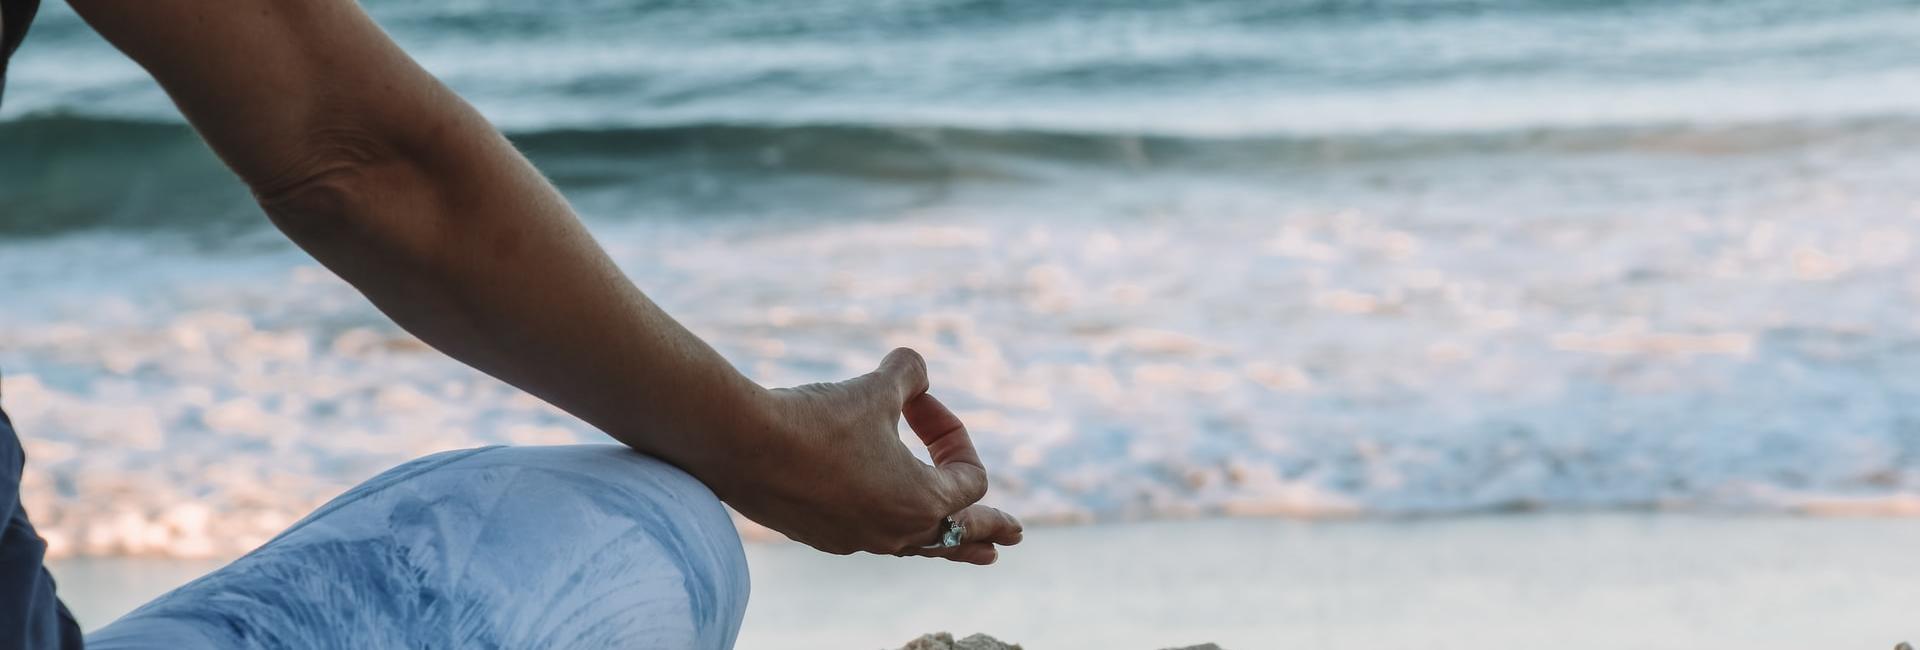 Yoga pose on the beach with ocean